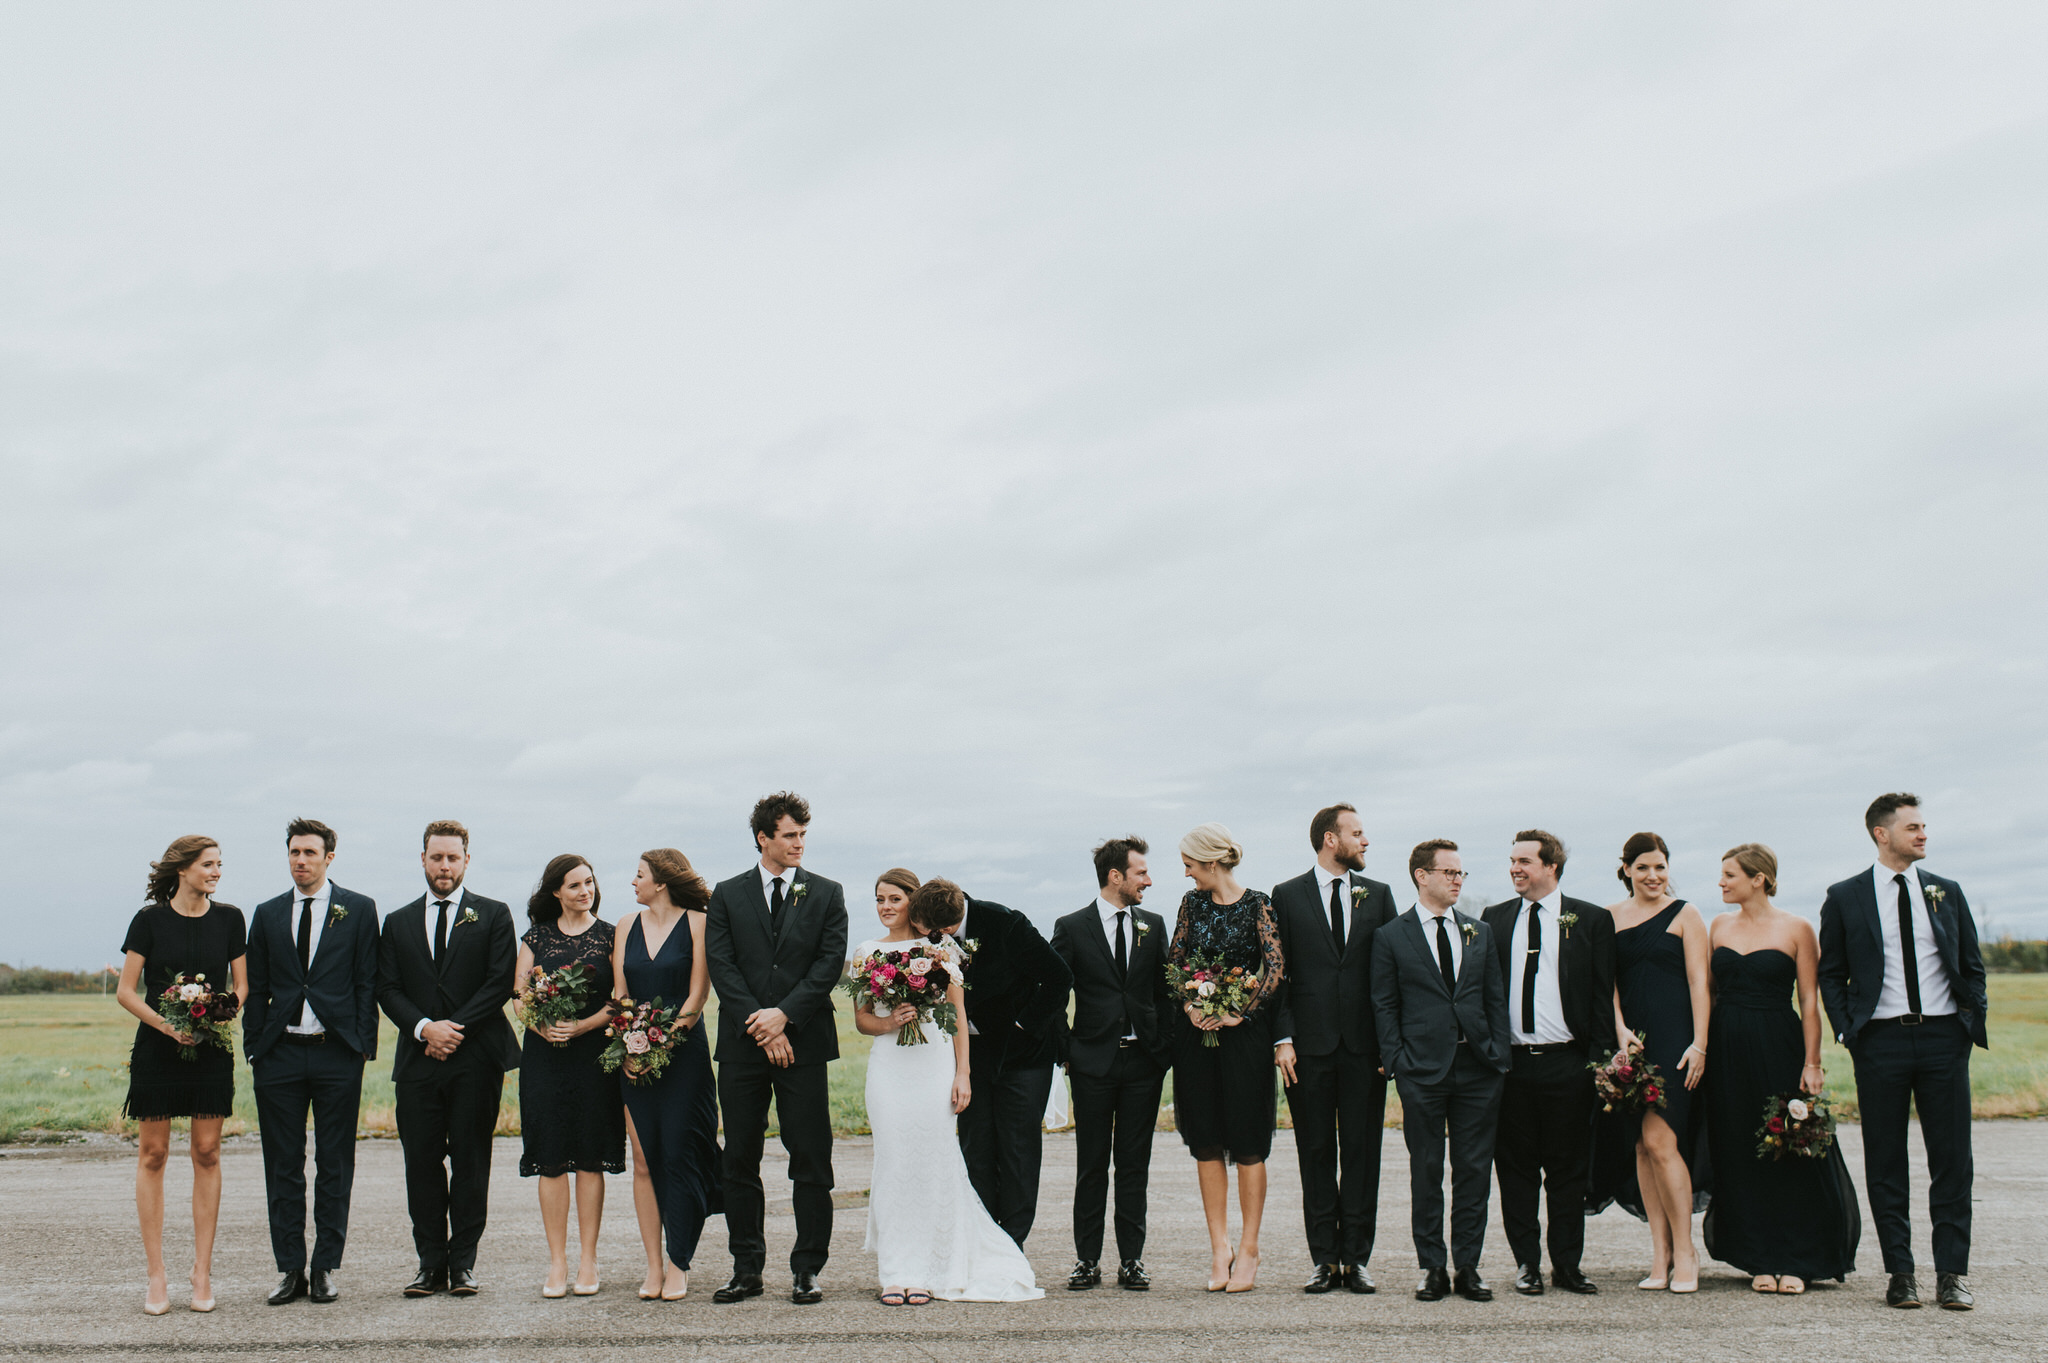 scarletoneillphotography_weddingphotography_prince edward county weddings058.JPG